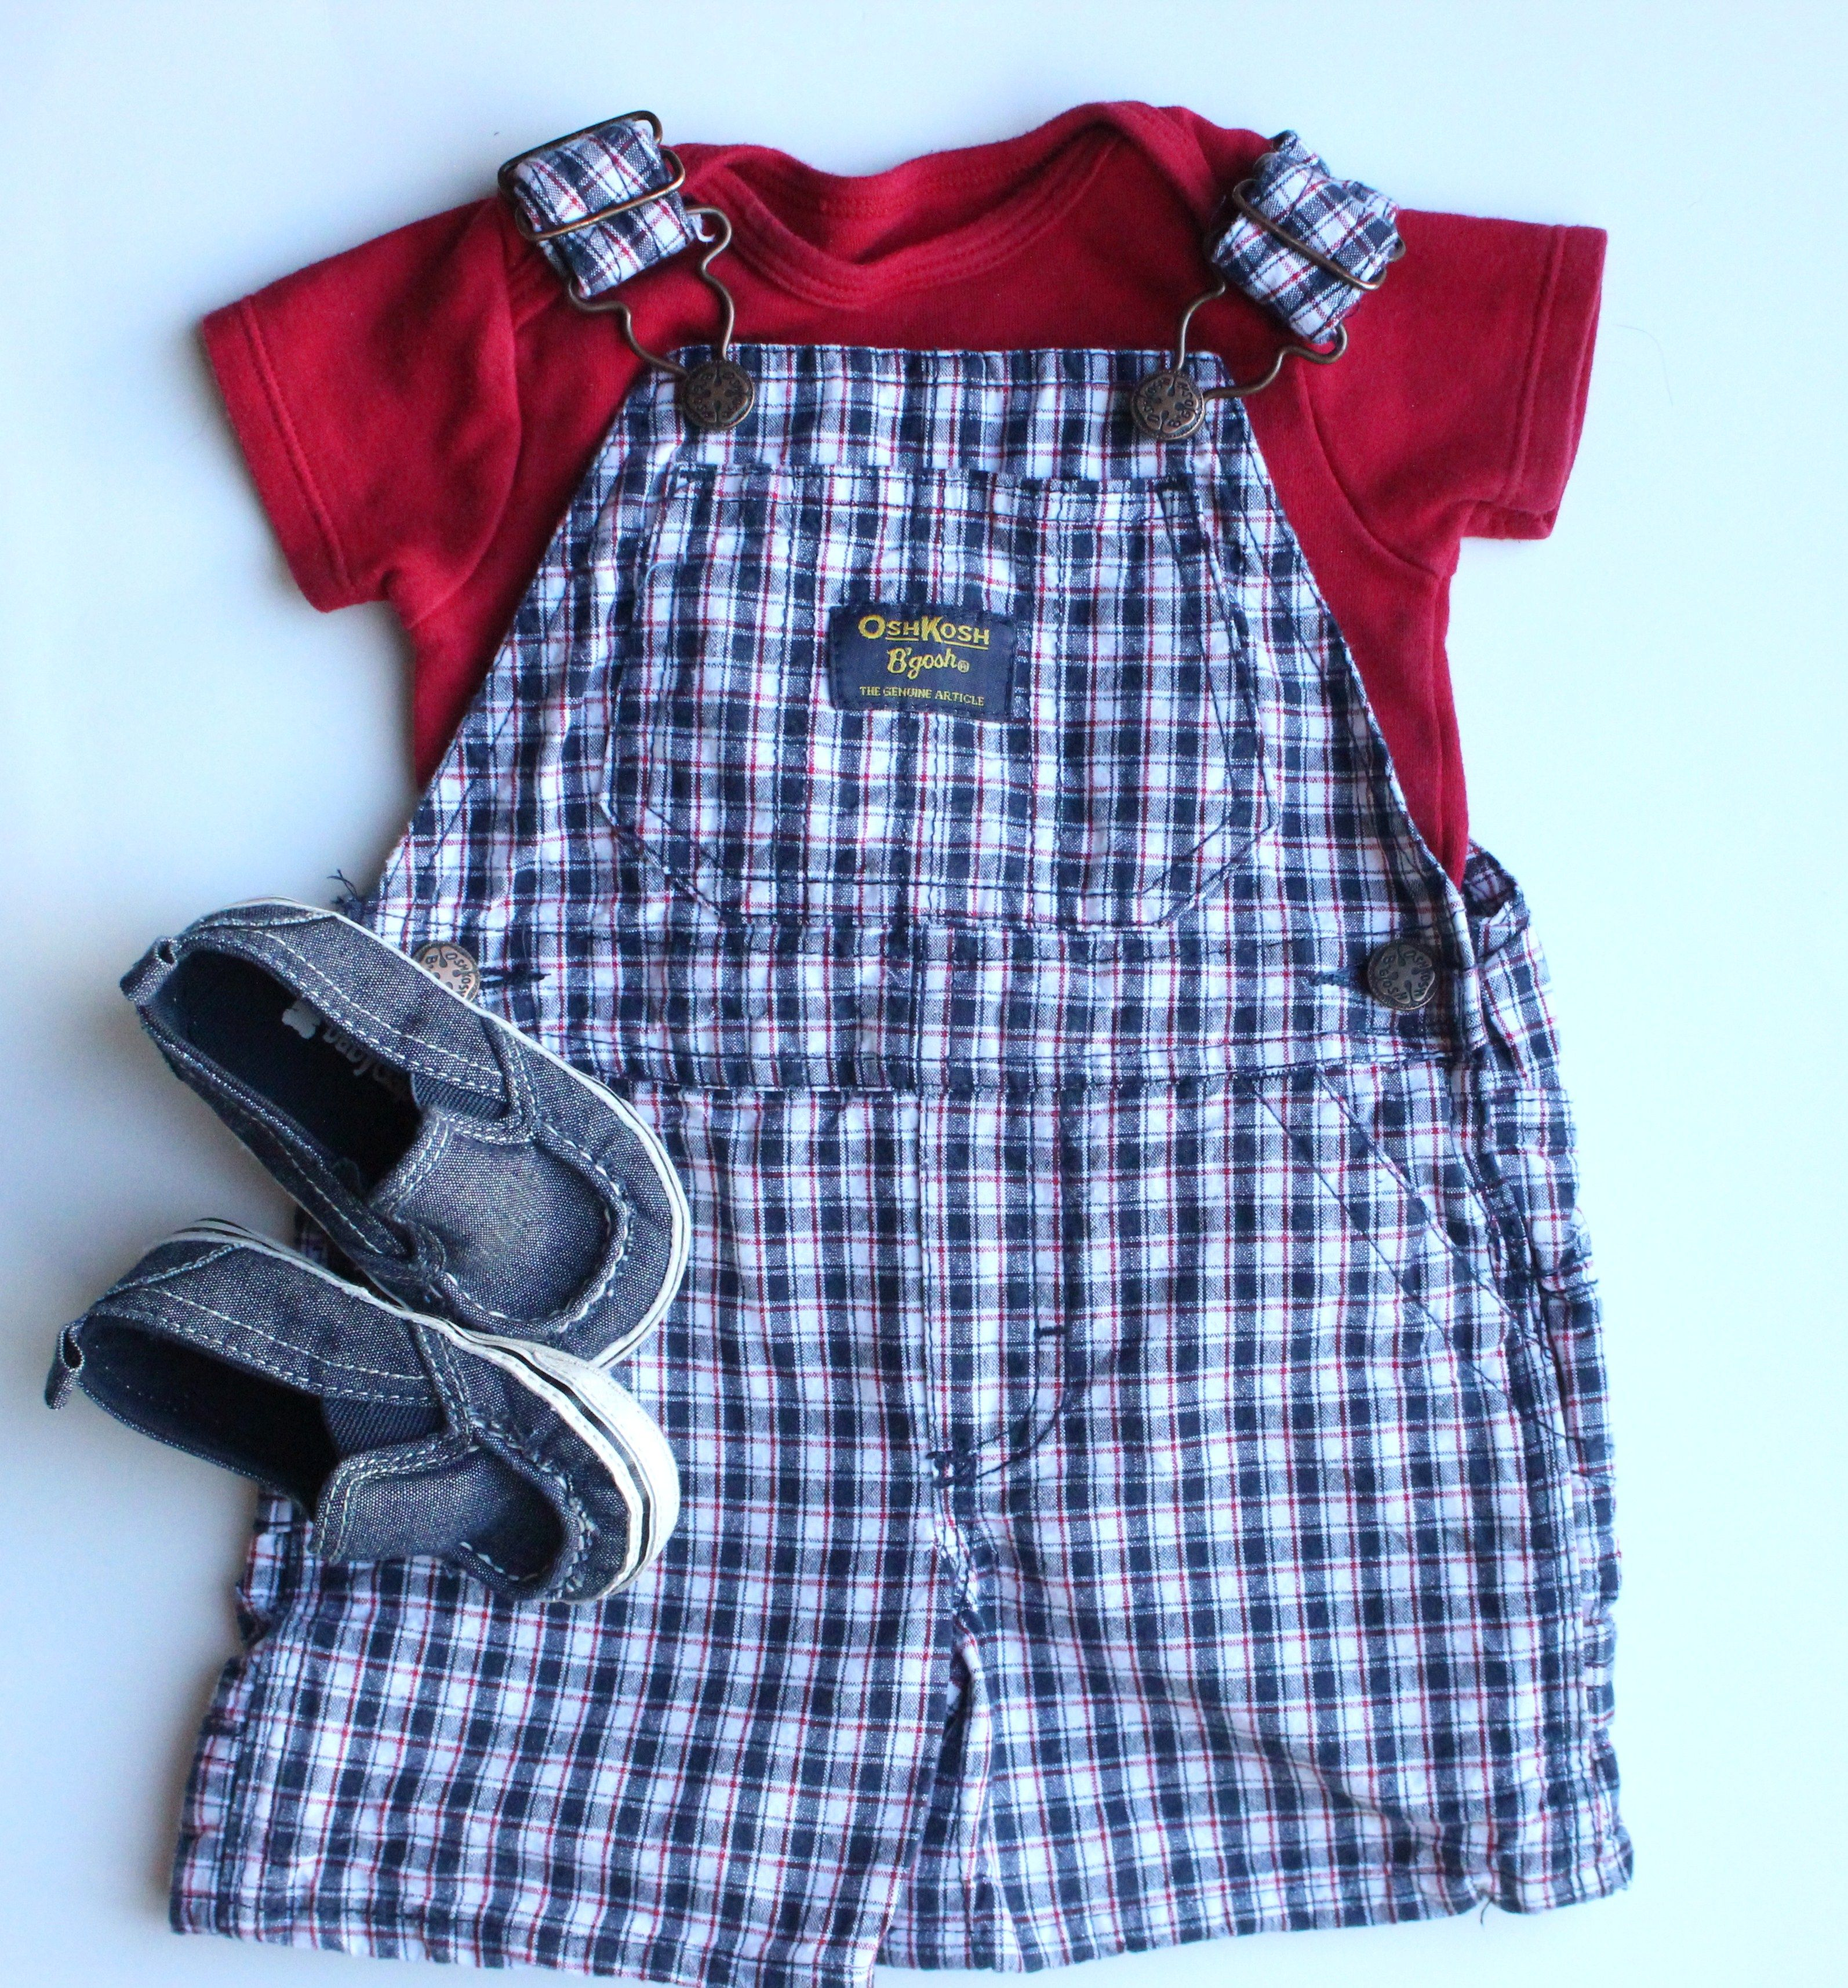 Cute Summer Baby Boy Outfit Osh Kosh Shortalls and Baby Gap Shoes